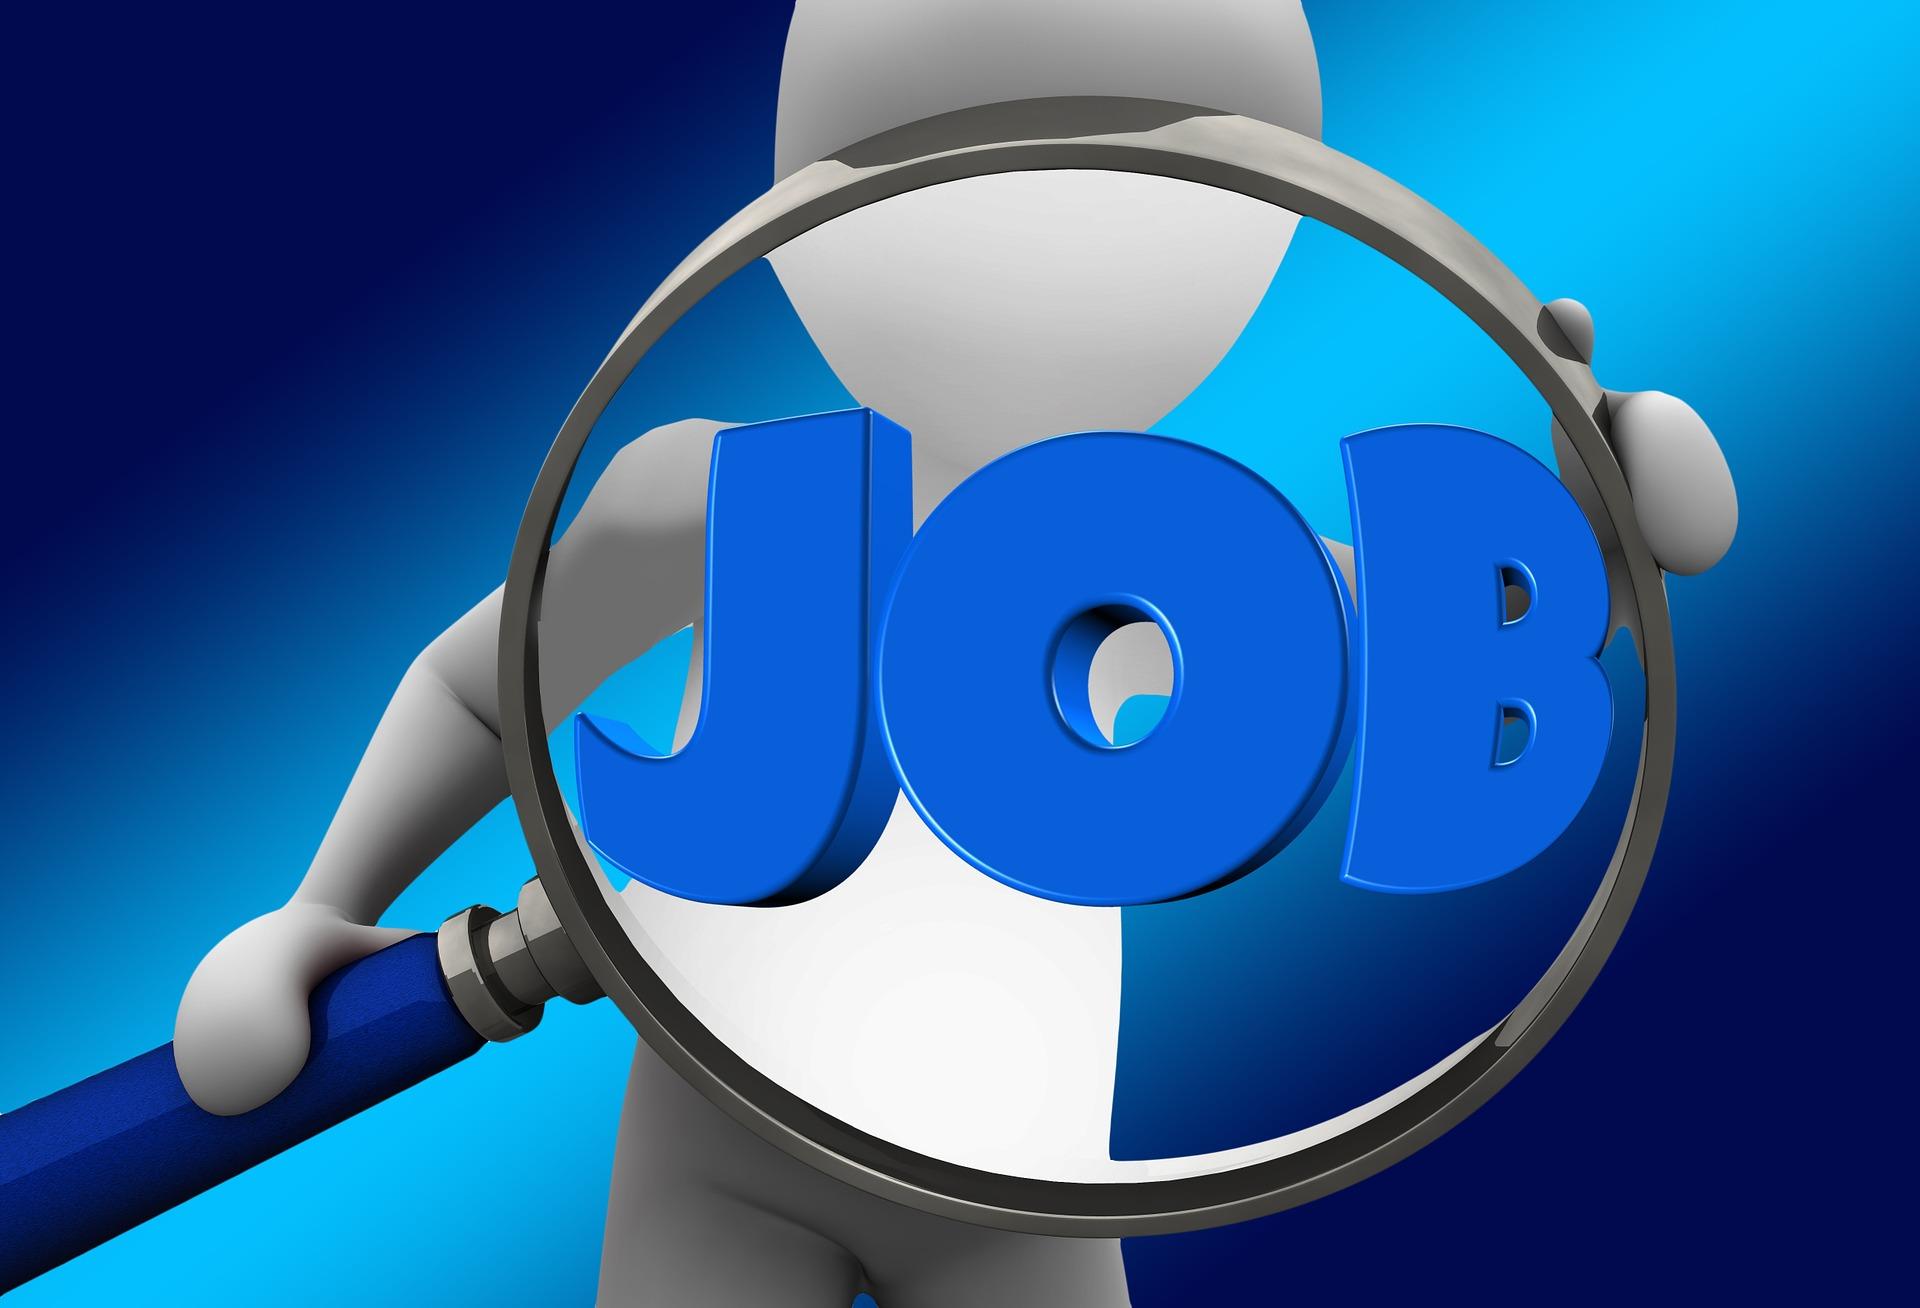 ICSI Recruitment For CRC Executives